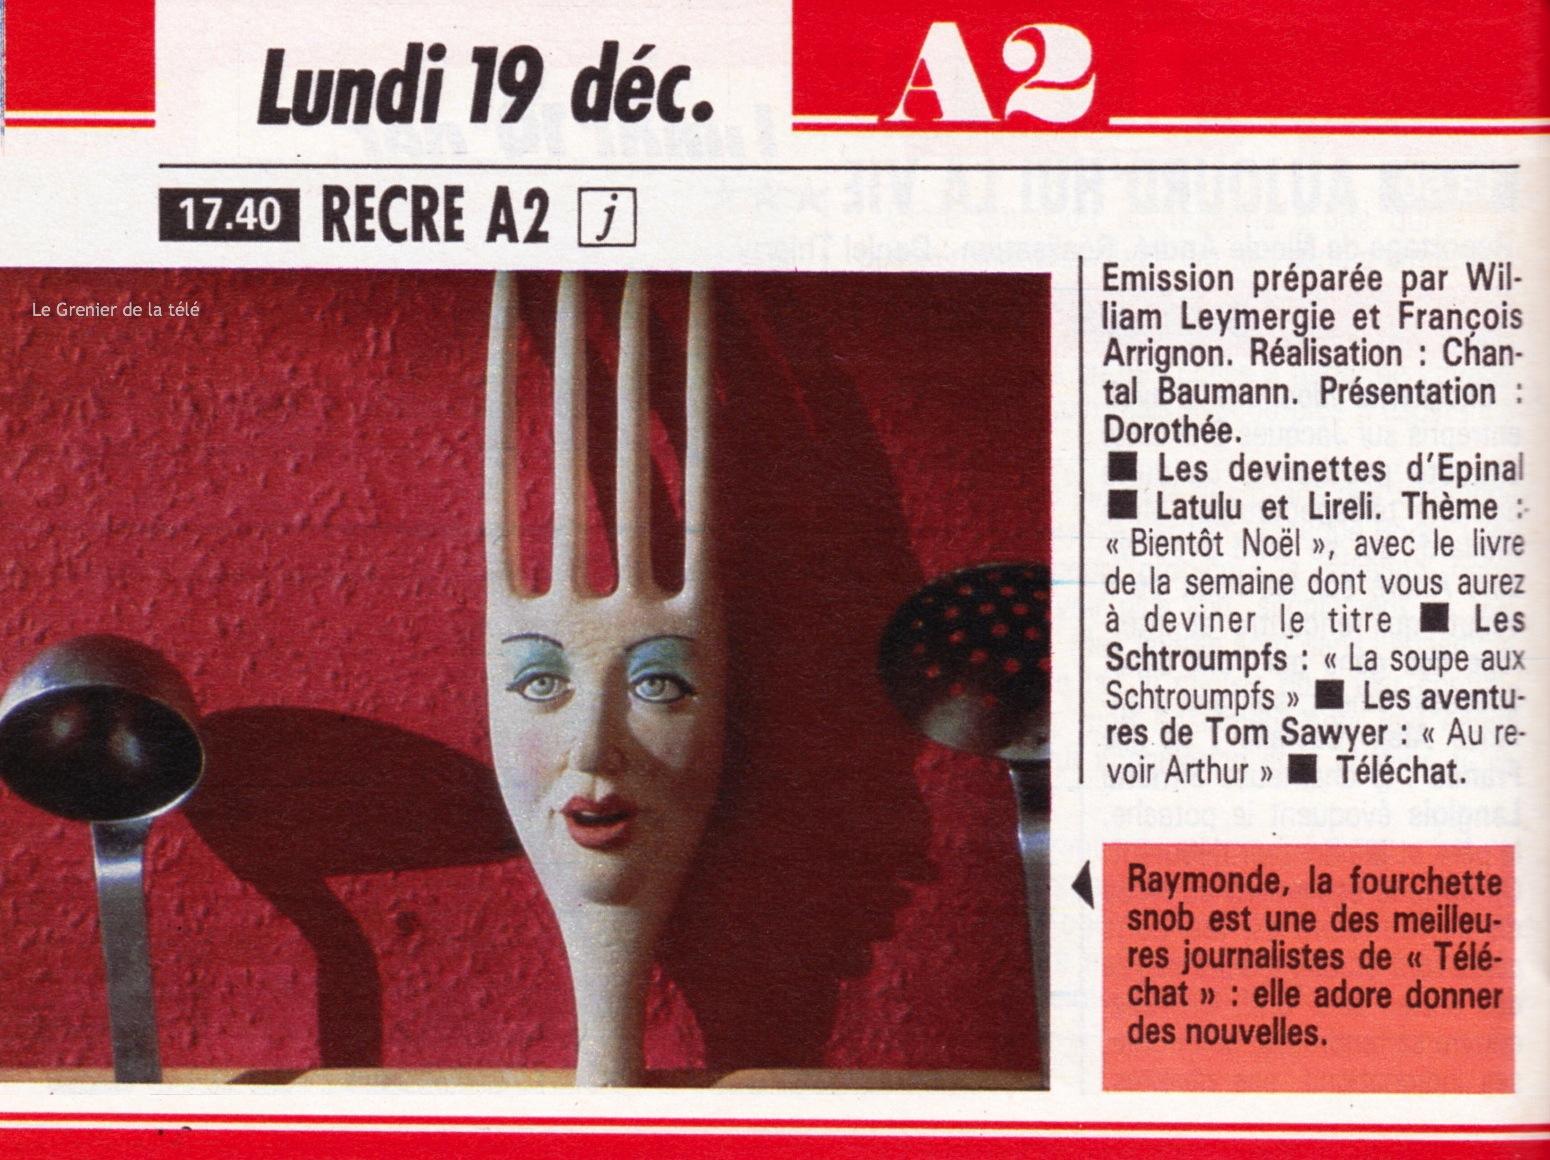 http://grenierdelatv.free.fr/recrea219decembre1983.jpg